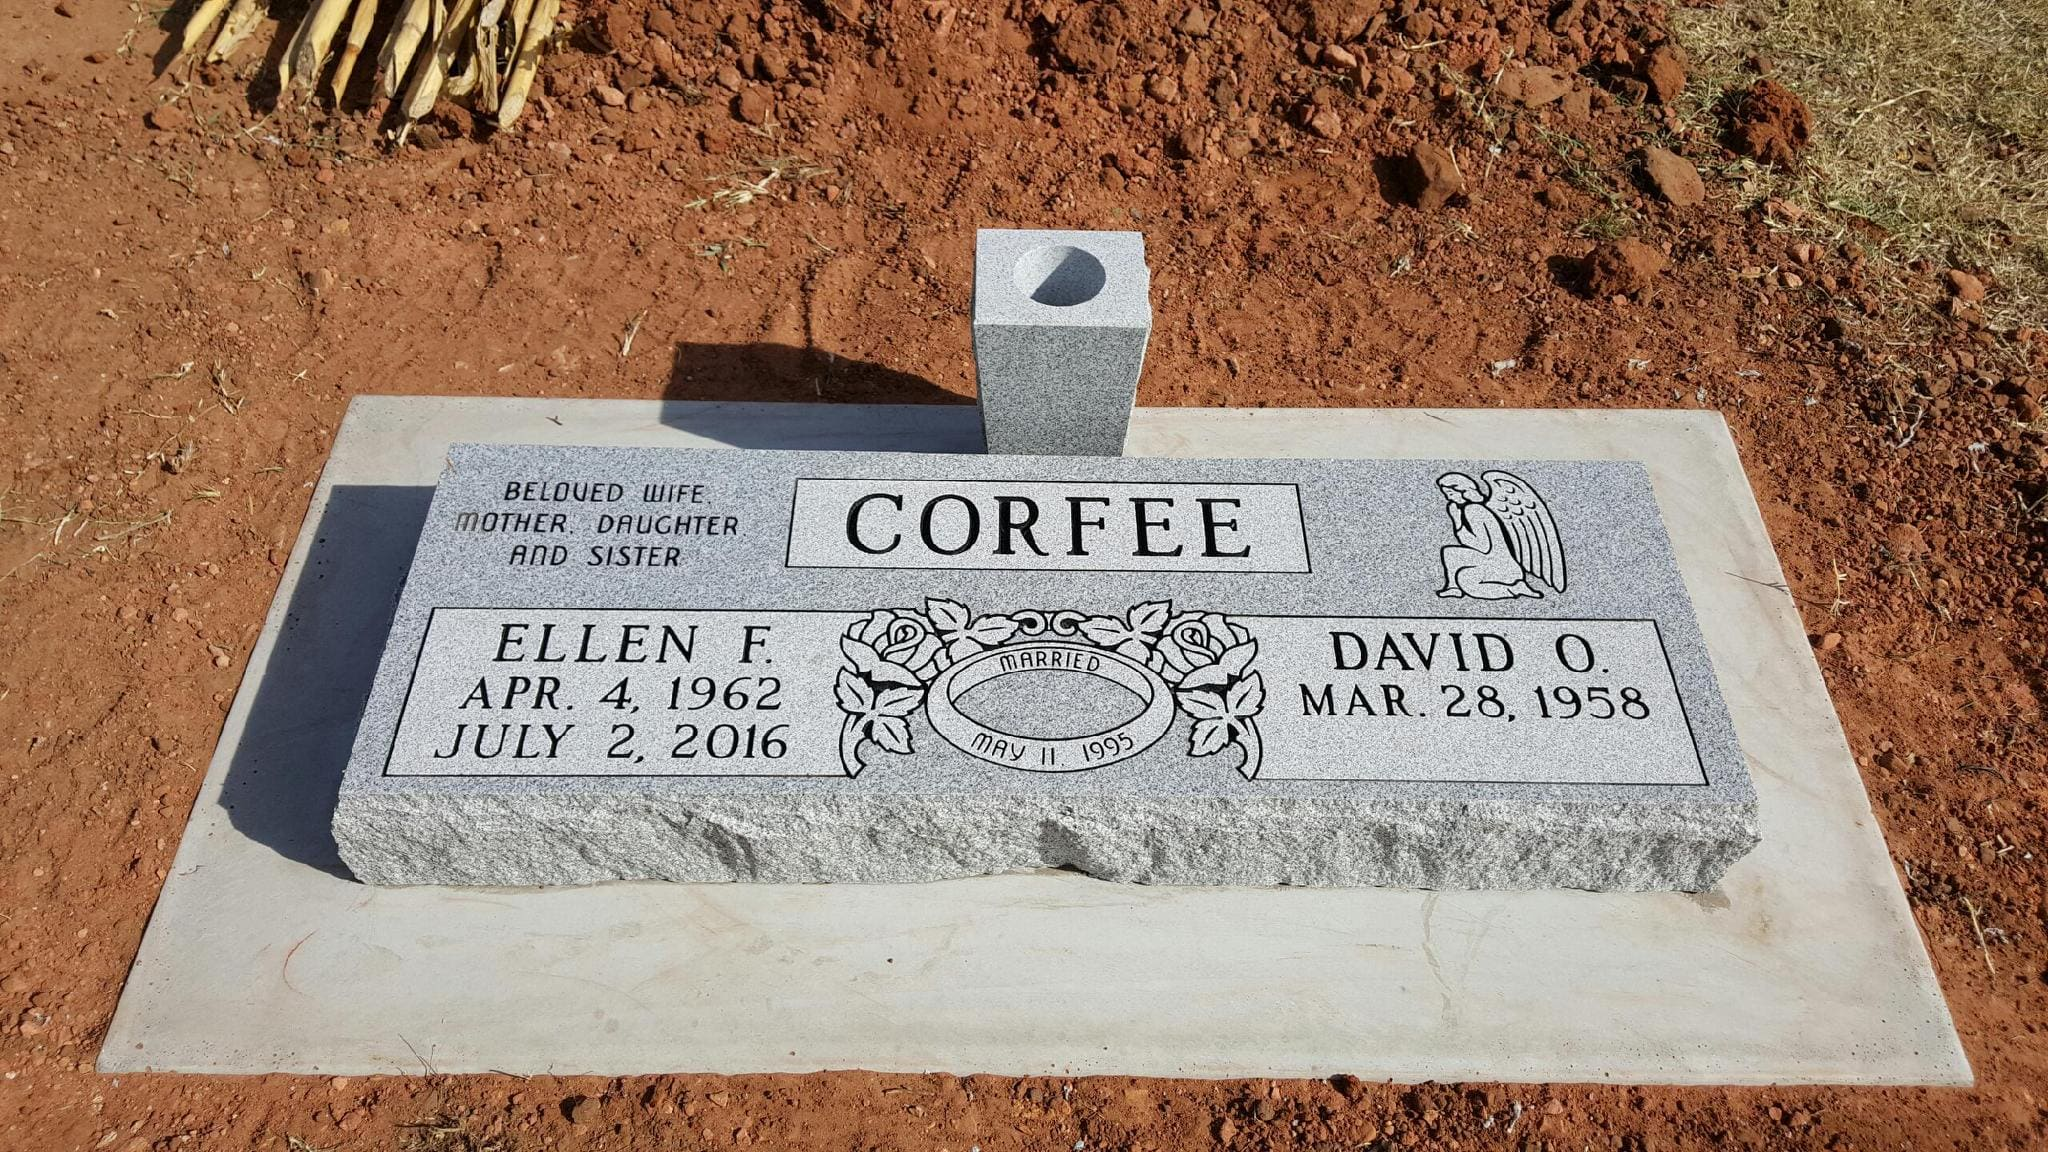 4. Frisco Cemetery